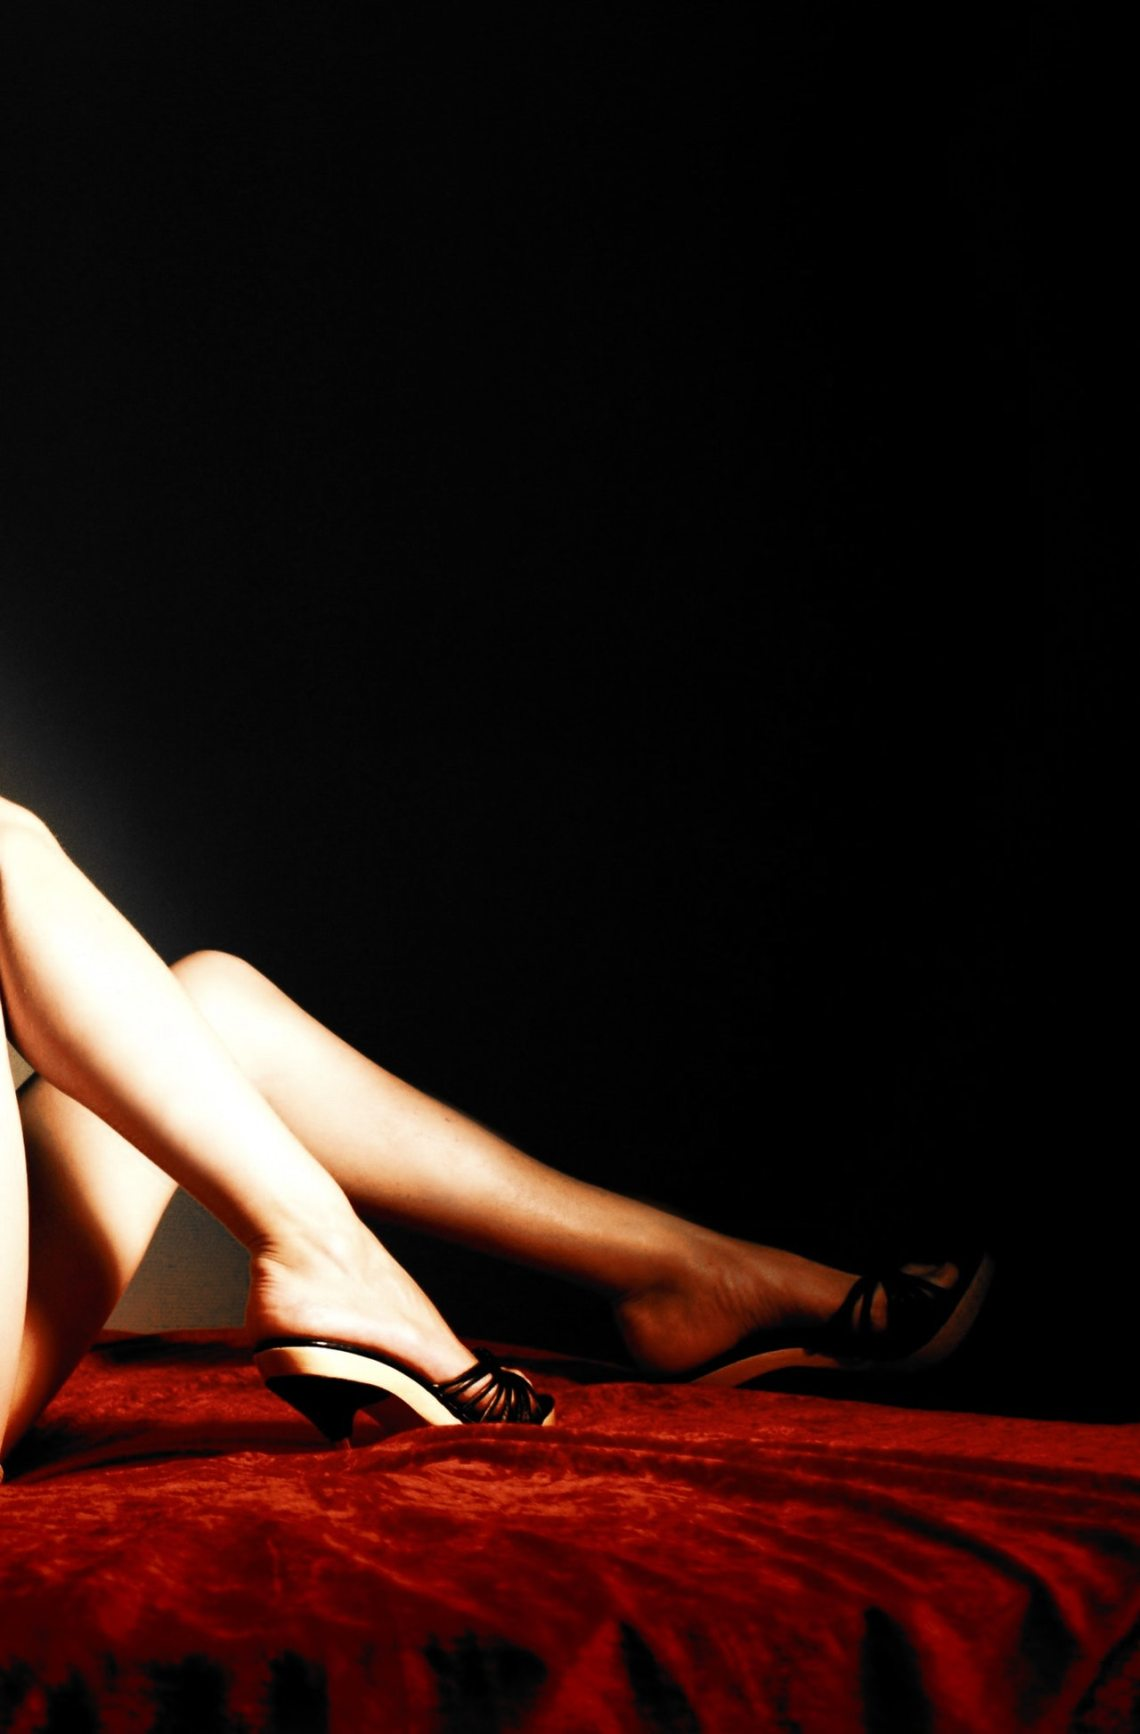 woman practicing BDSM